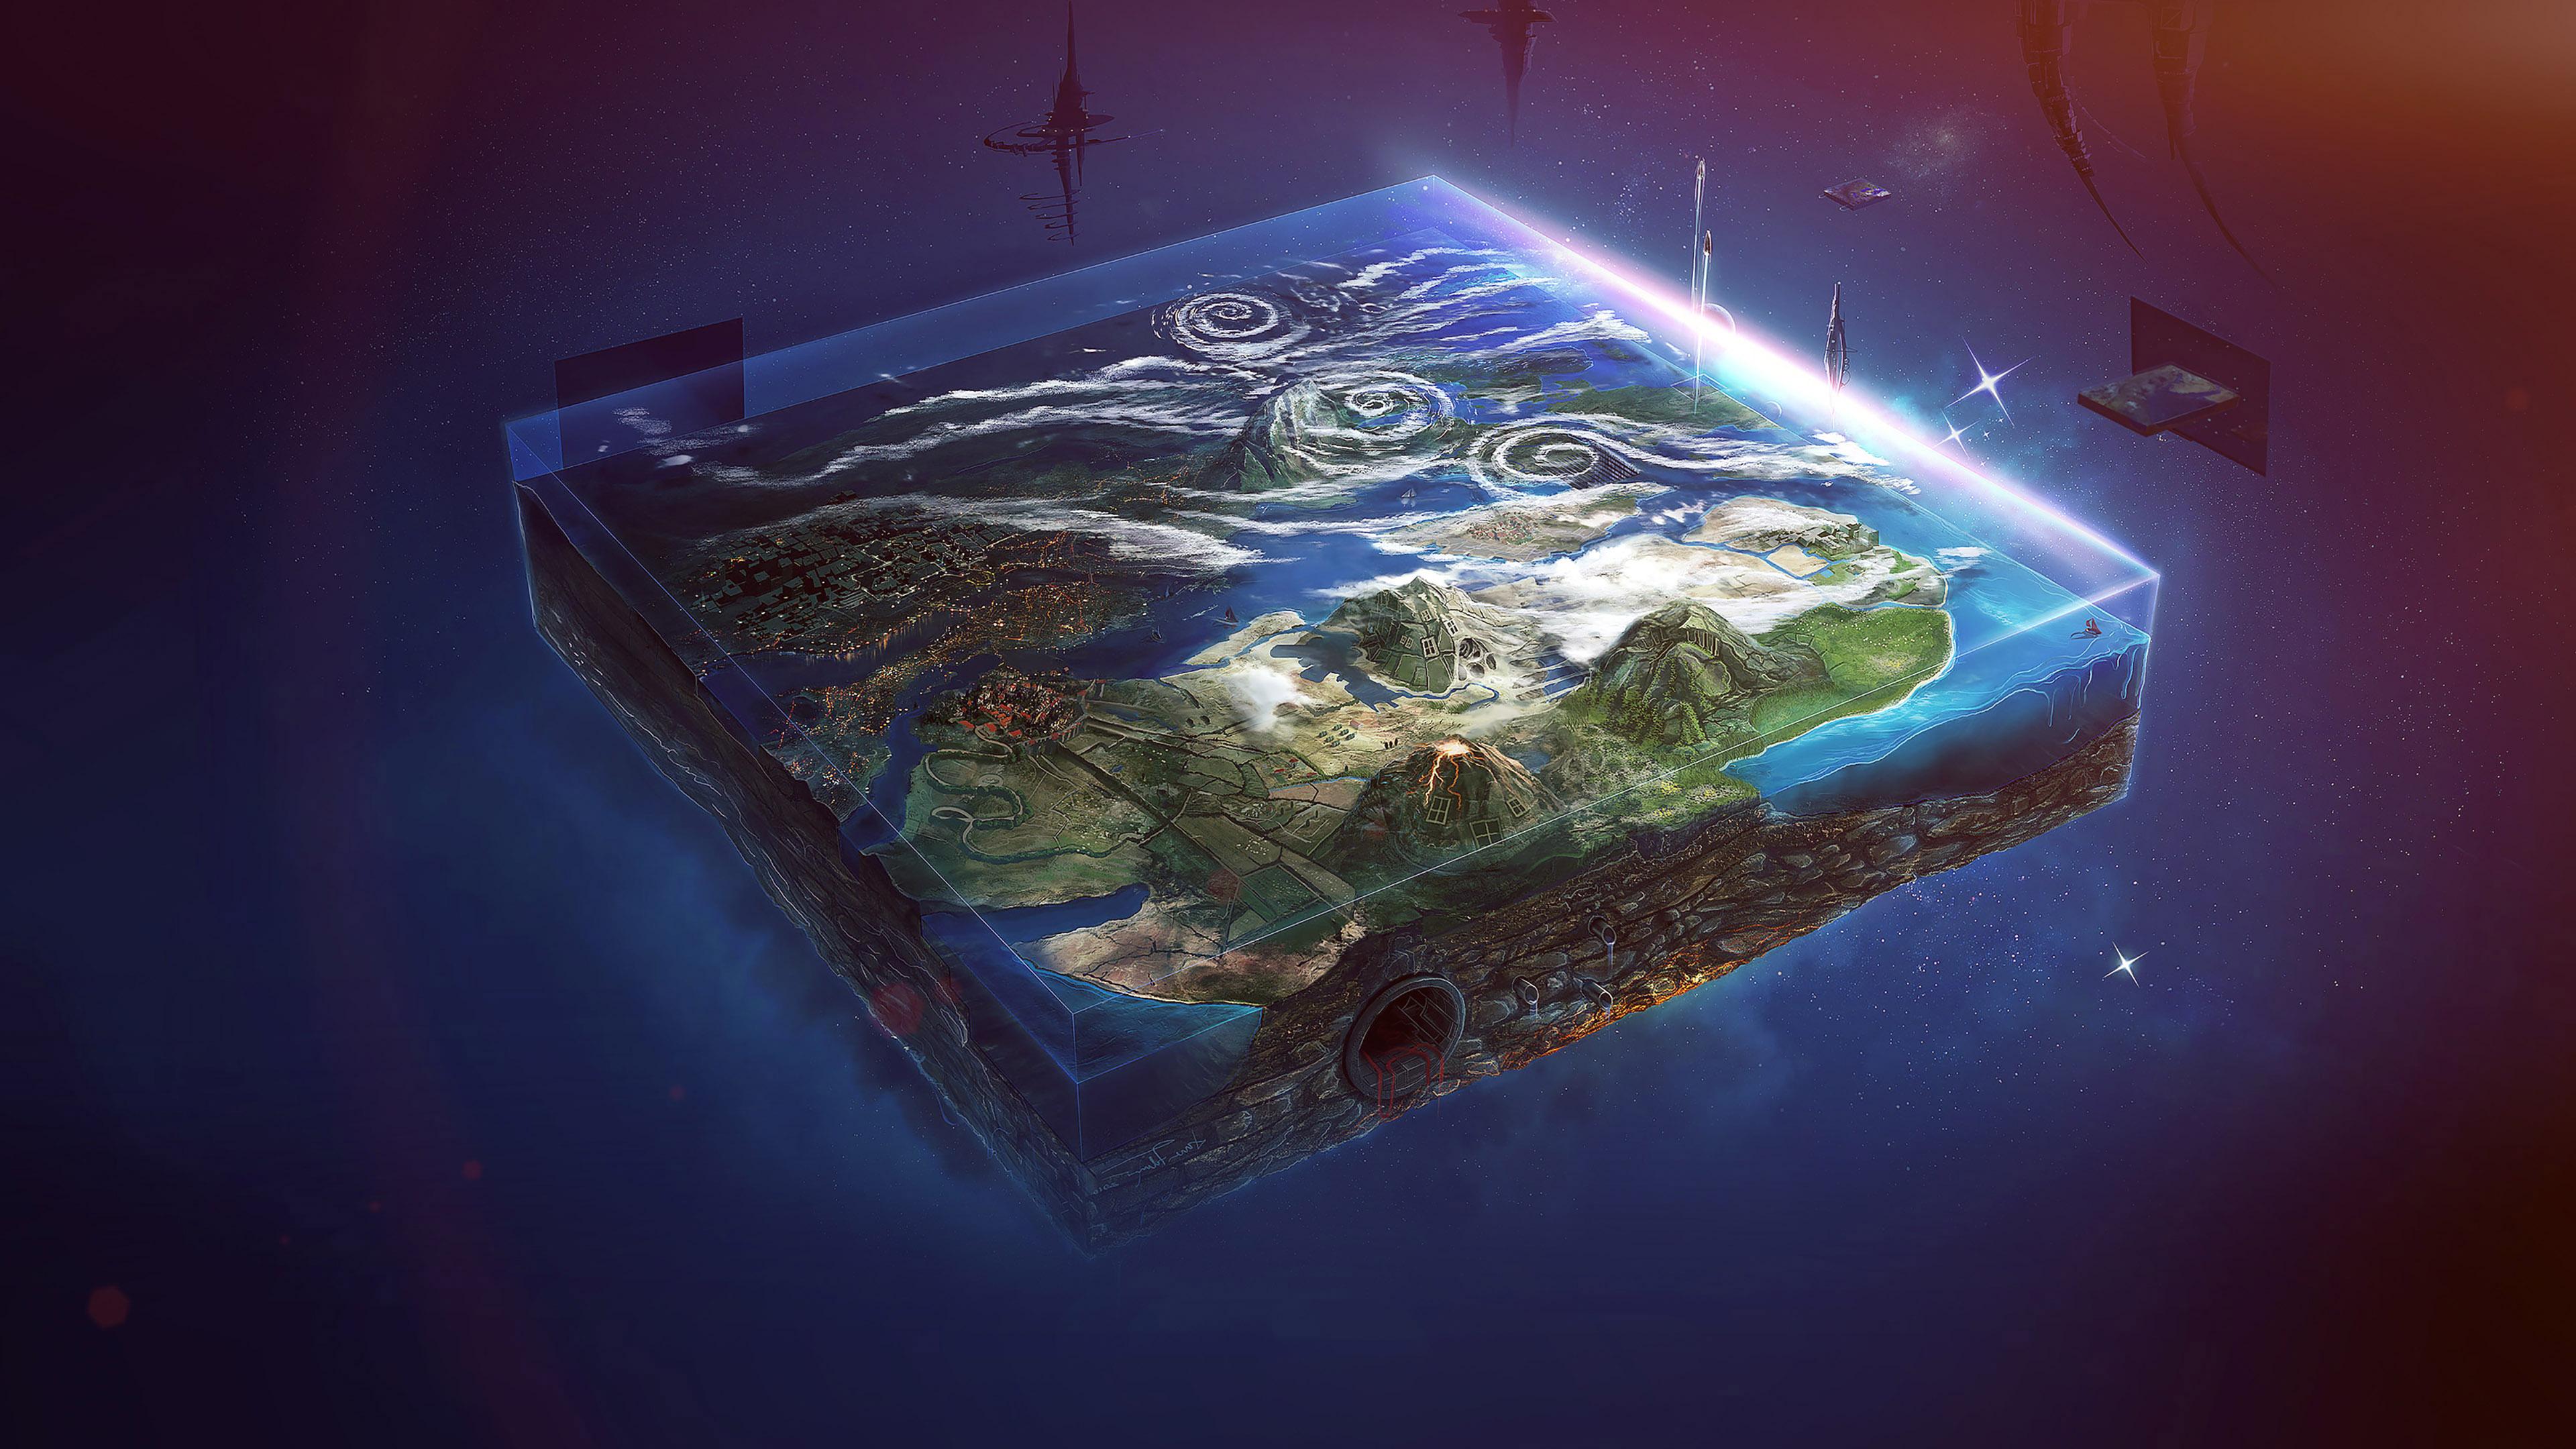 Animated Flower Wallpaper Ai95 Flat Earth Art Flare Illust Space Wallpaper